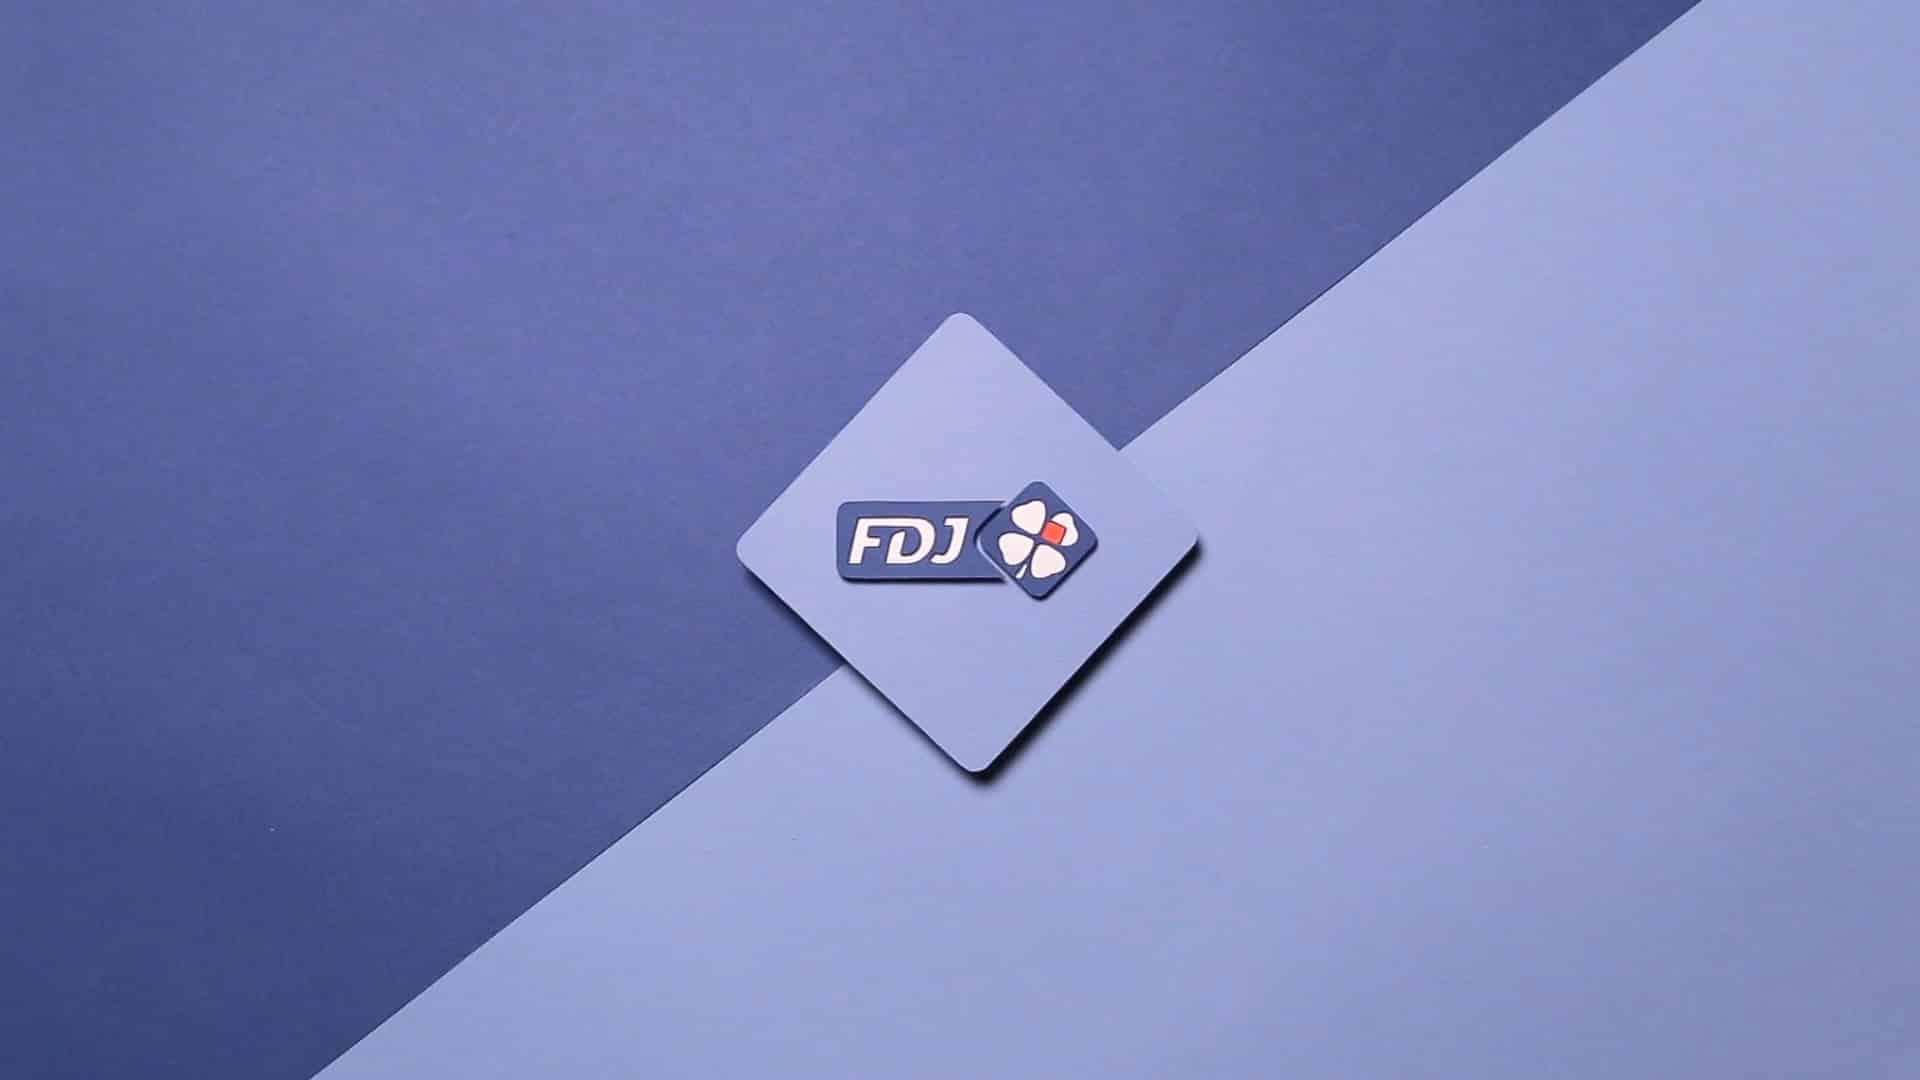 FDJ Image video